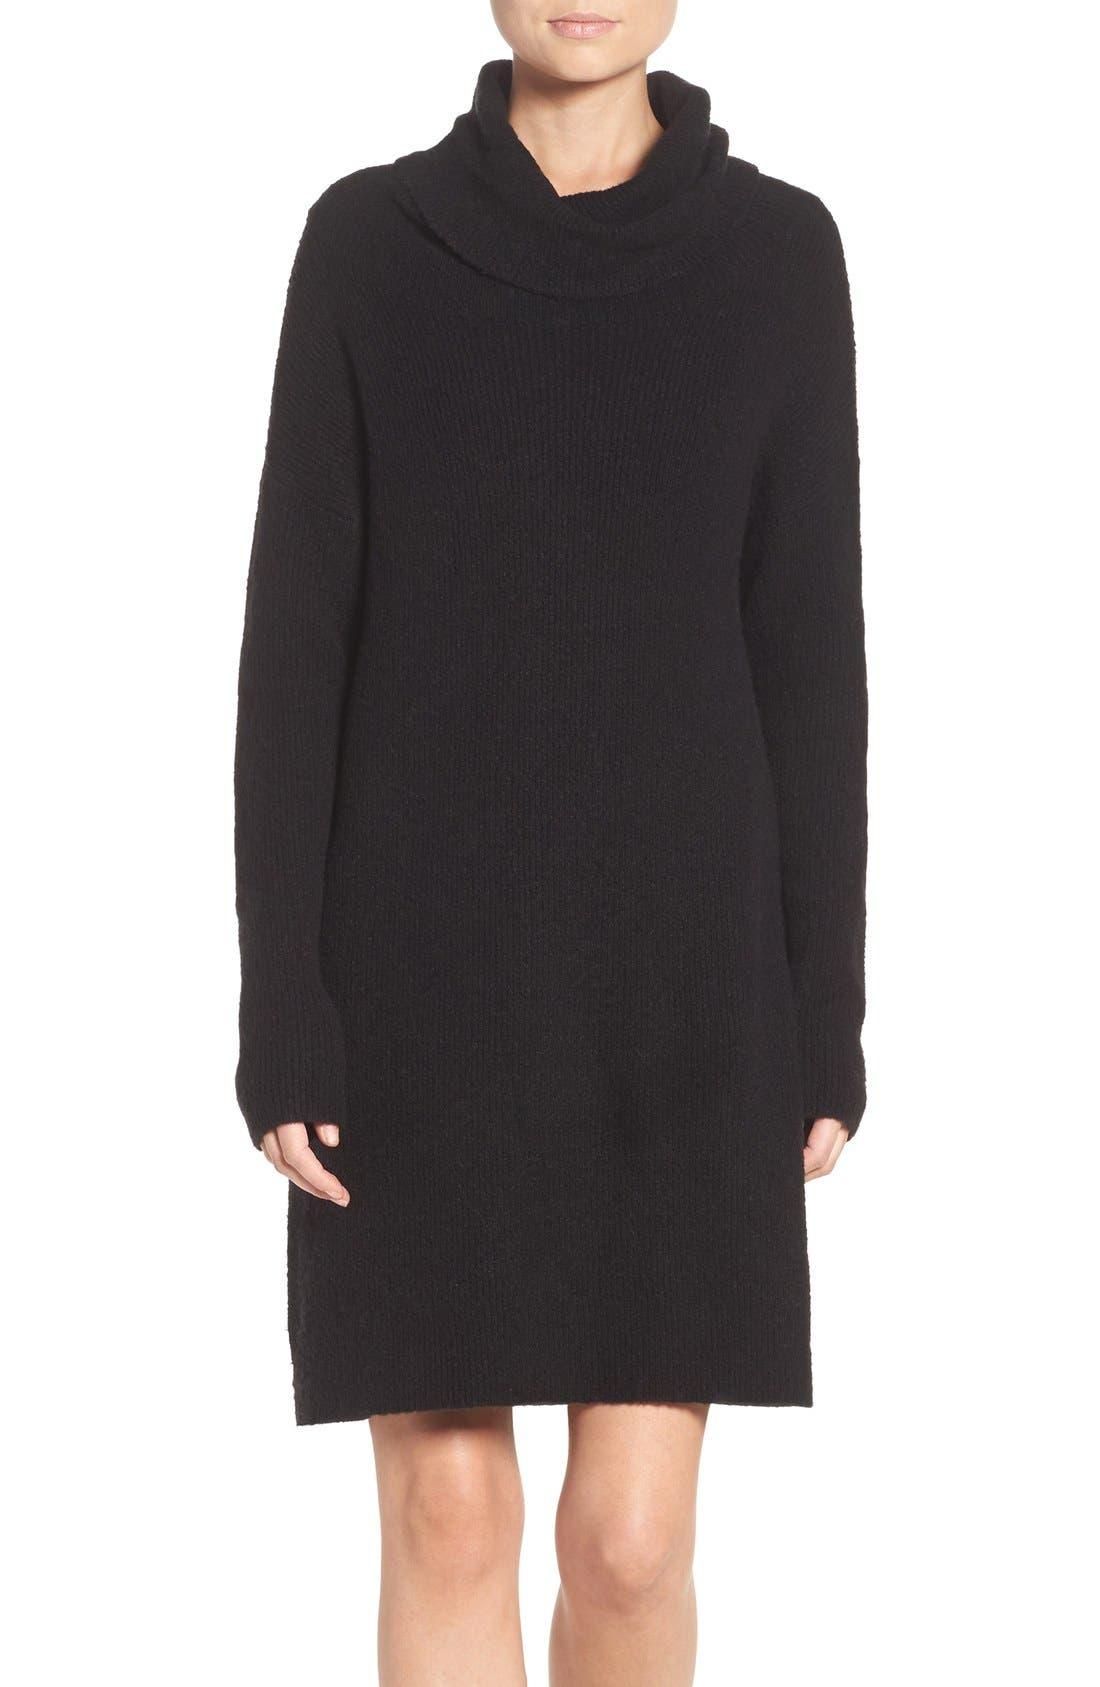 Alternate Image 1 Selected - BB Dakota 'Collins' Ribbed Sweater Dress